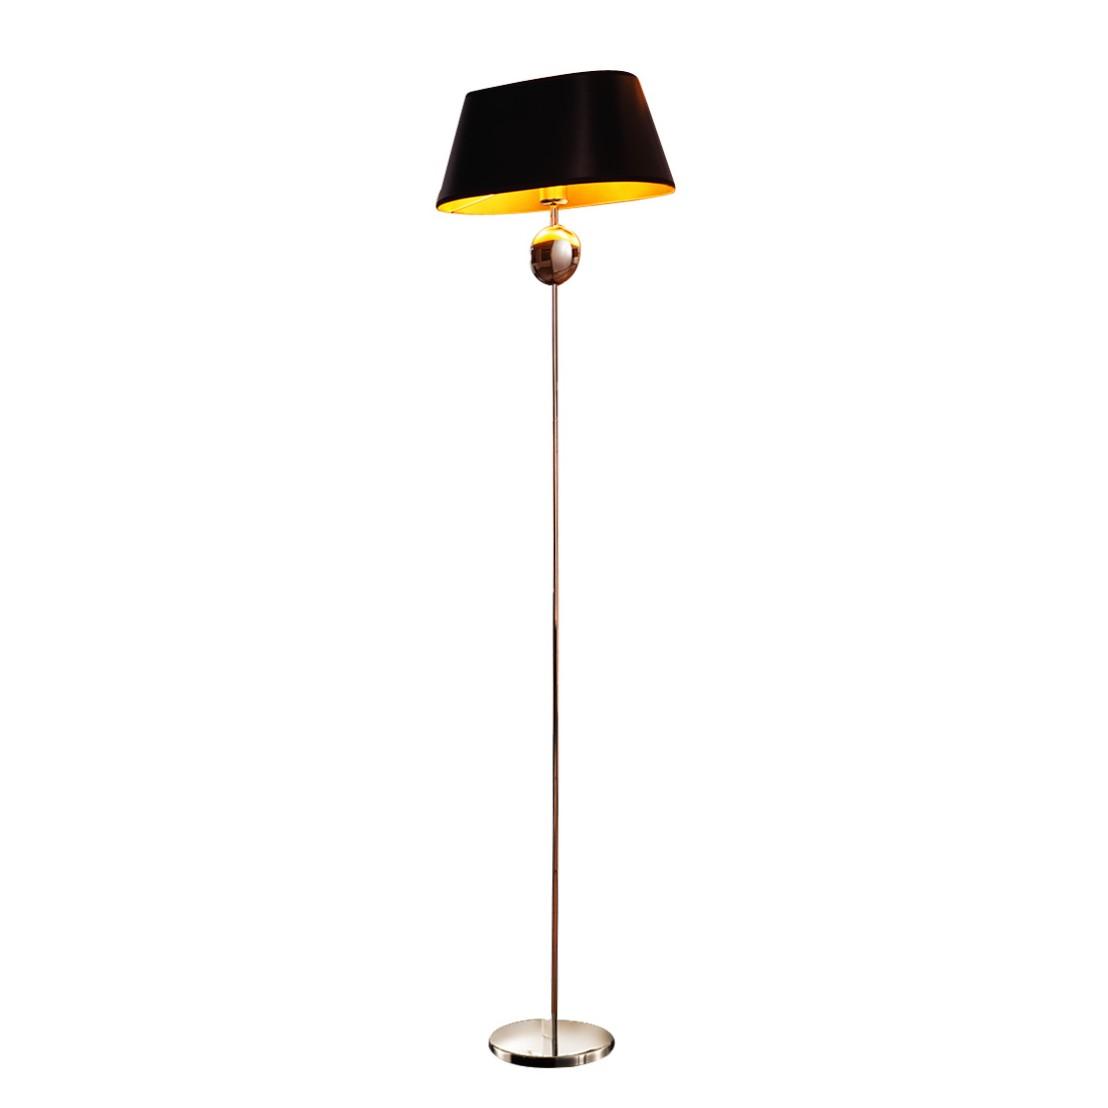 EEK A++, Lampadaire Indus - Papier / Acier inoxydable - 1 ampoule, Lampadina